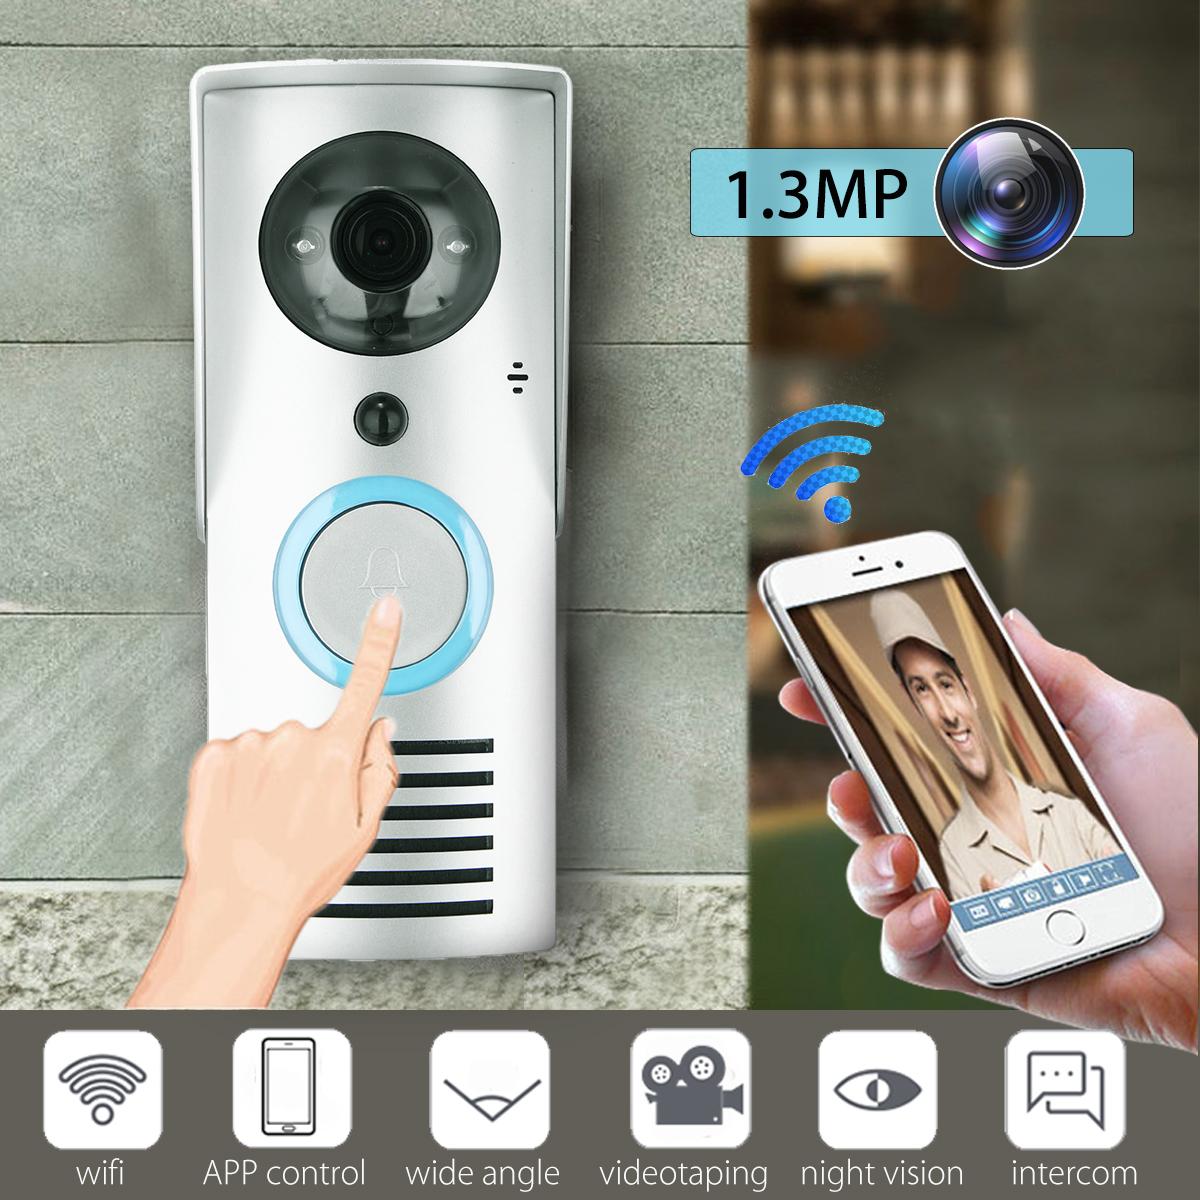 WIFI Wireless Smart Home Night Visual Video Door Bell Security 720P Camera Phone App Control Intercom Alarm Clear Night Vision Doorbell